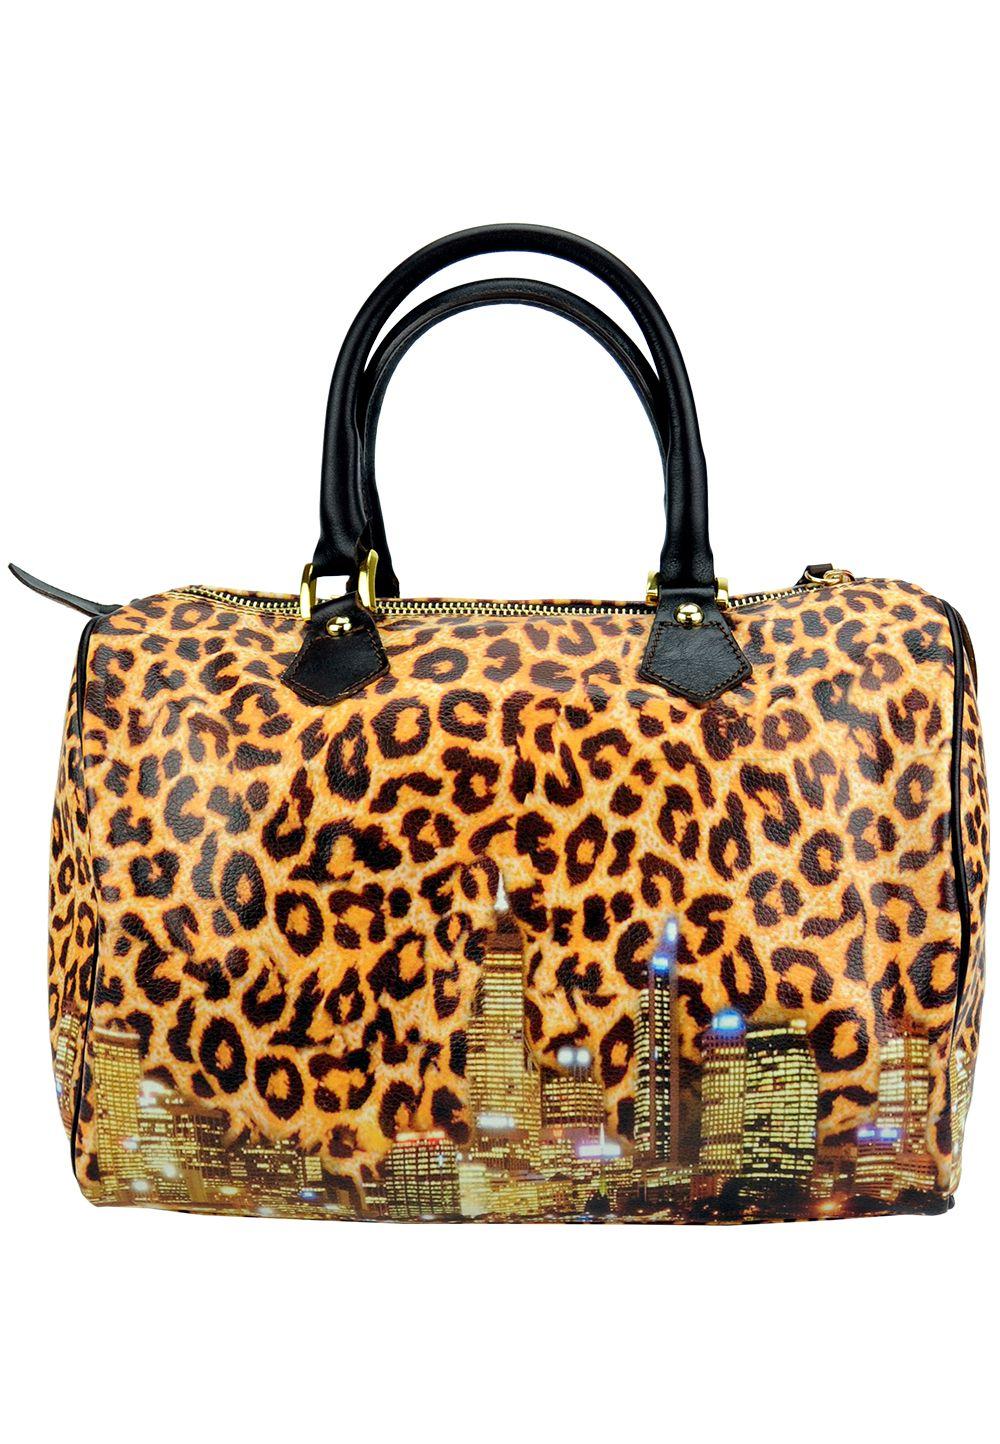 Giulia Italian Genuine Leather Medium Handmade Handbag in Leopard with City Scape